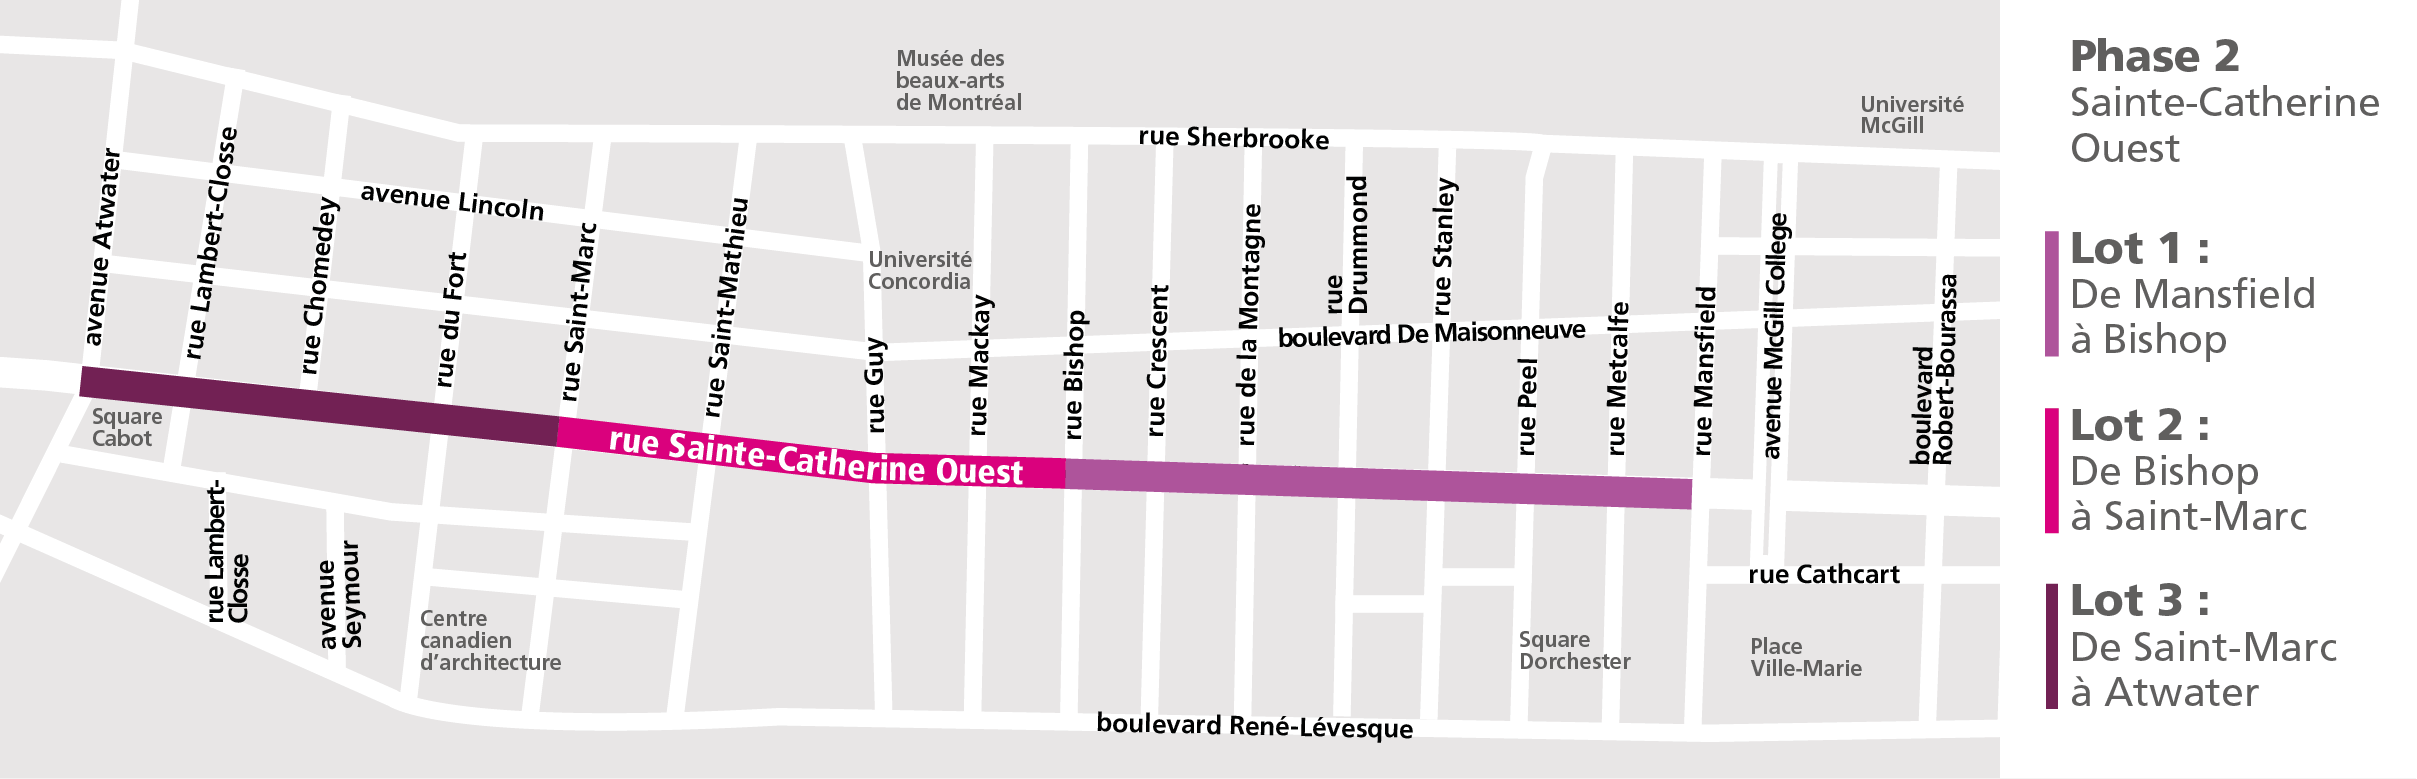 Phase 2 - Sainte-Catherine Project